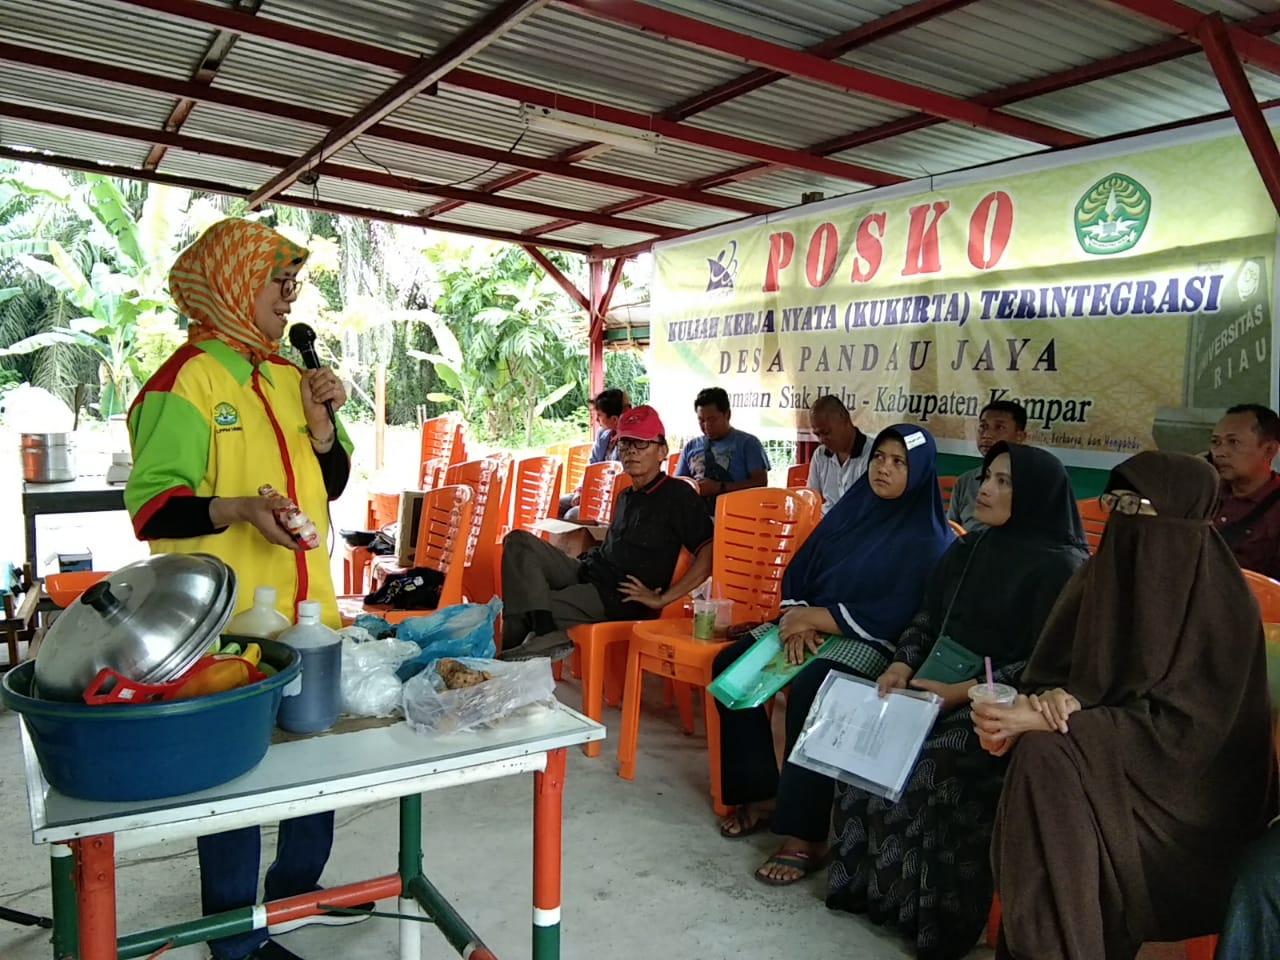 Kukerta Terintegrasi UNRI Latih Ibu PKK Desa Pandau Jaya